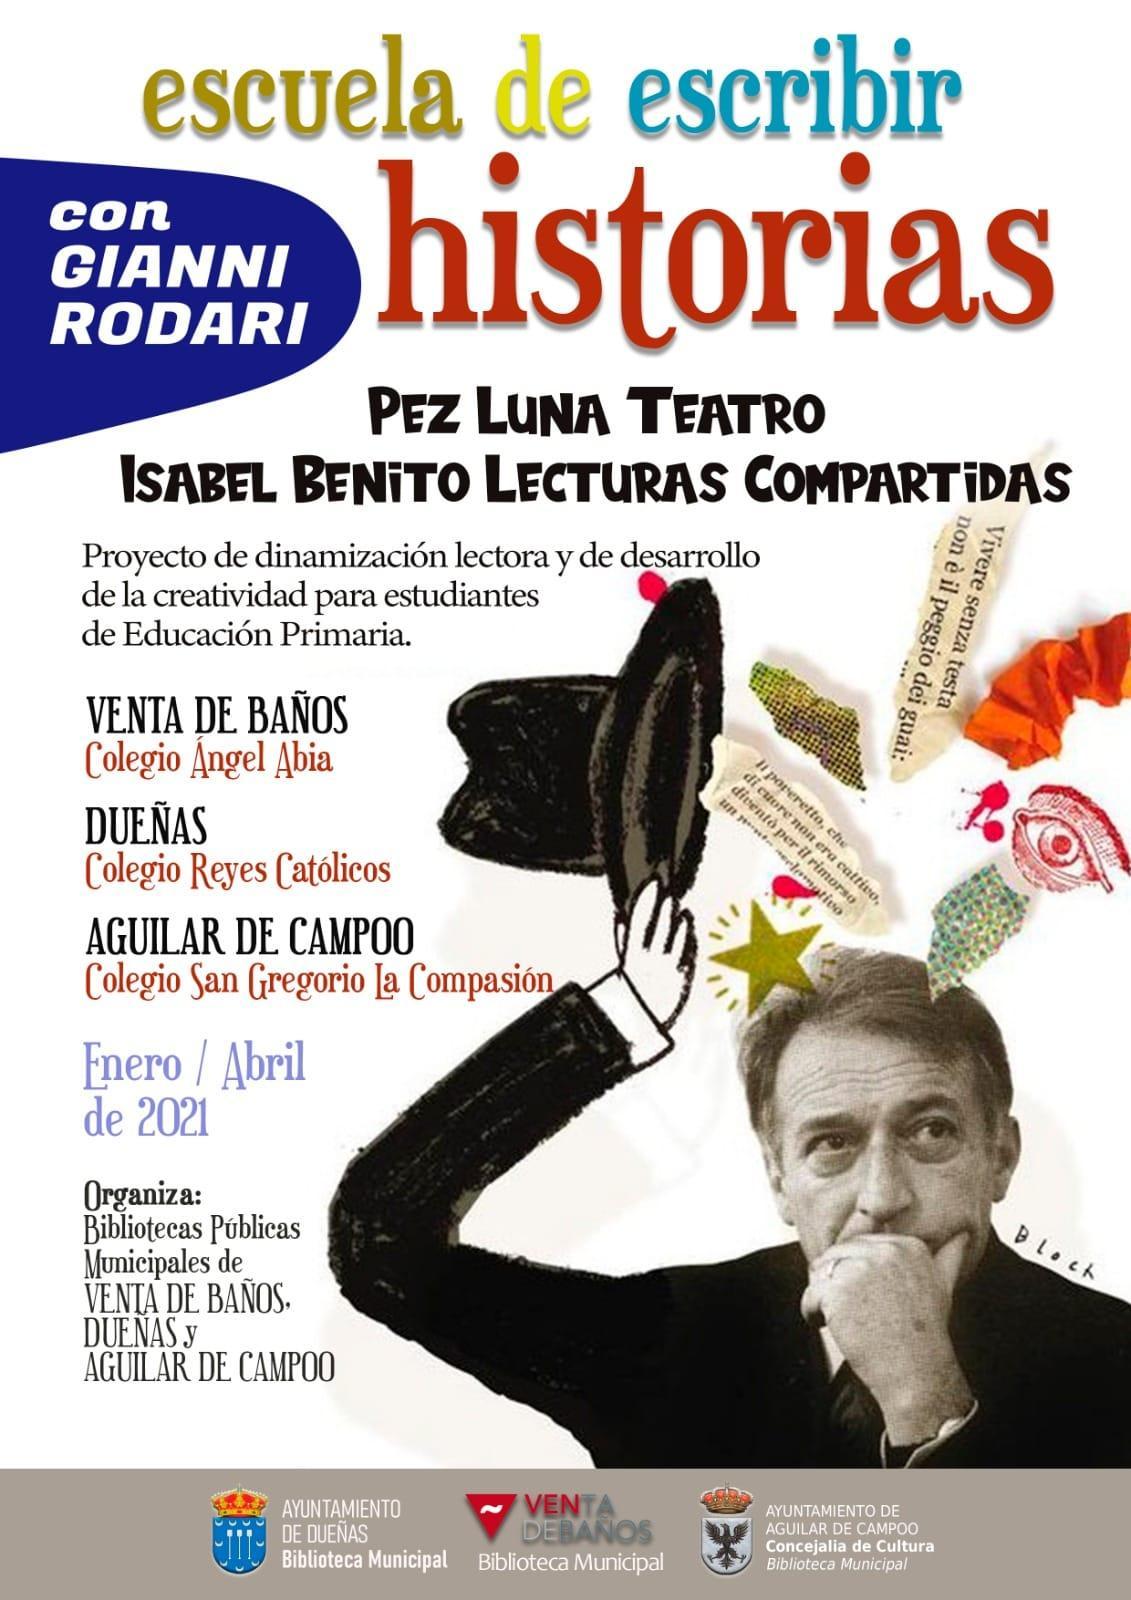 ESCUELA DE ESCRIBIR HISTORIAS0